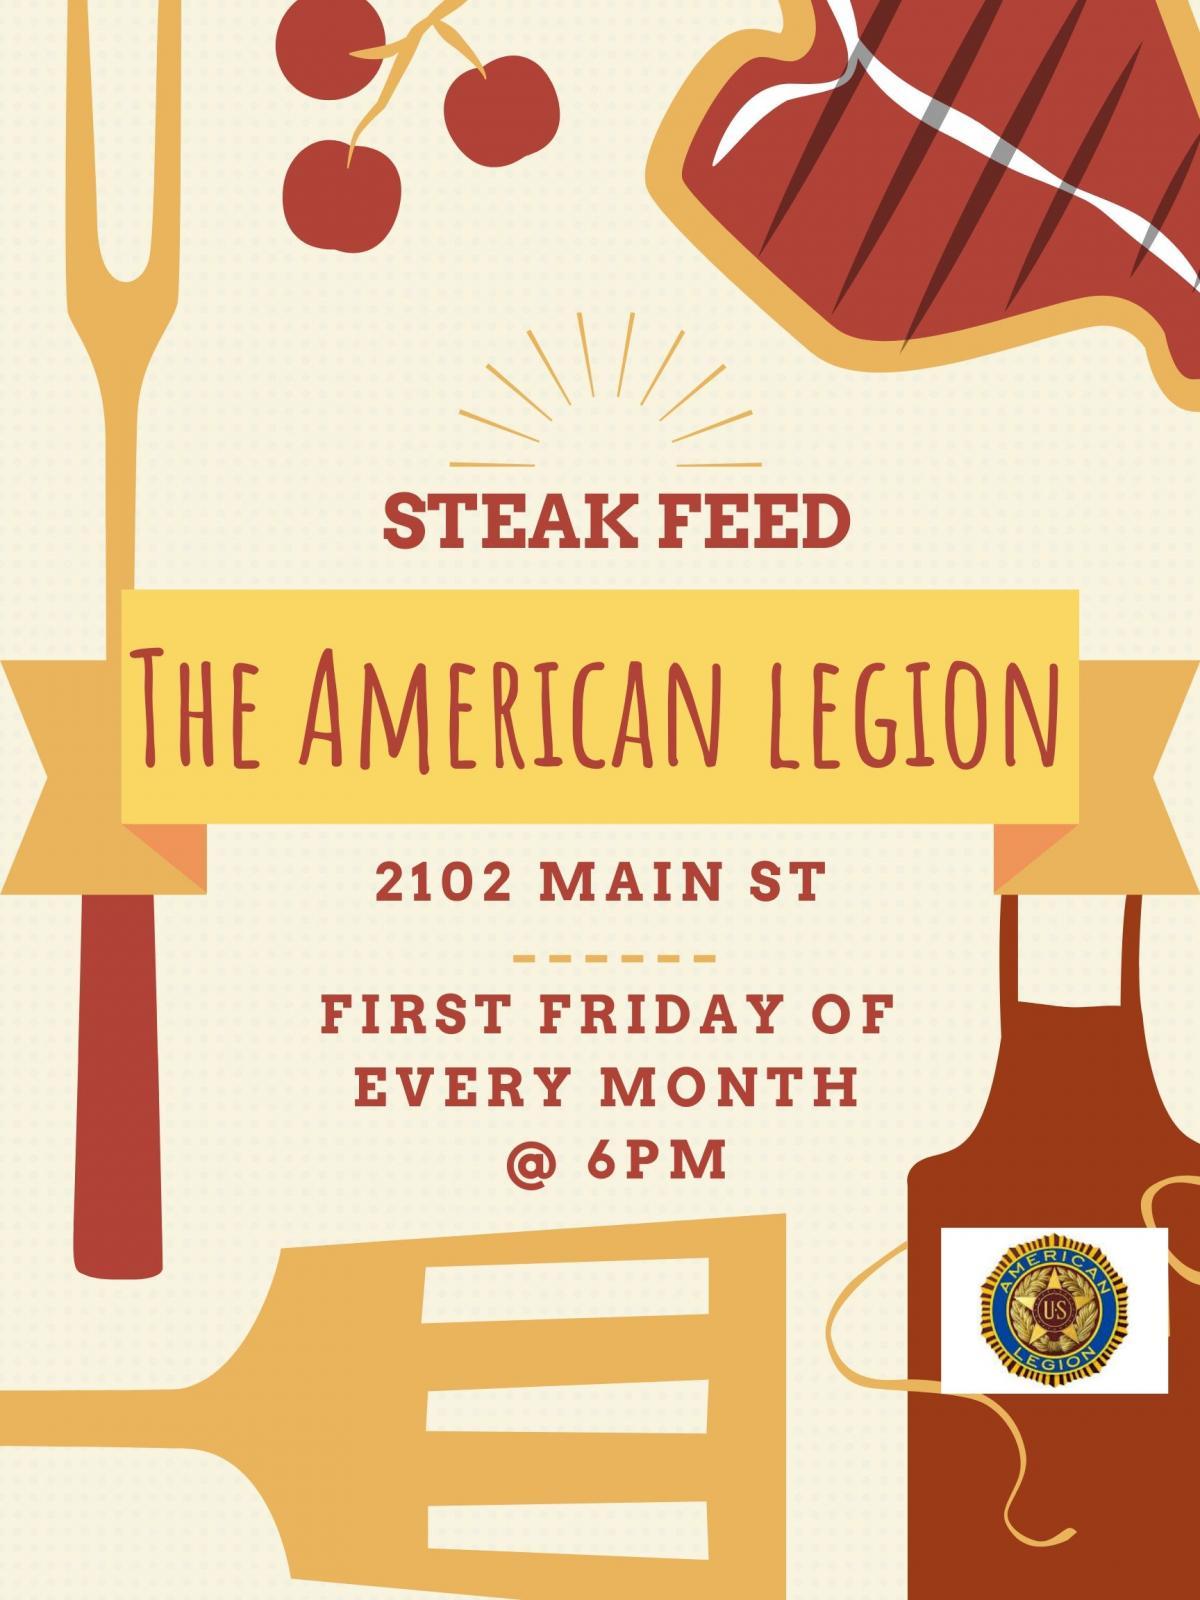 American Legion Steak Feed Photo